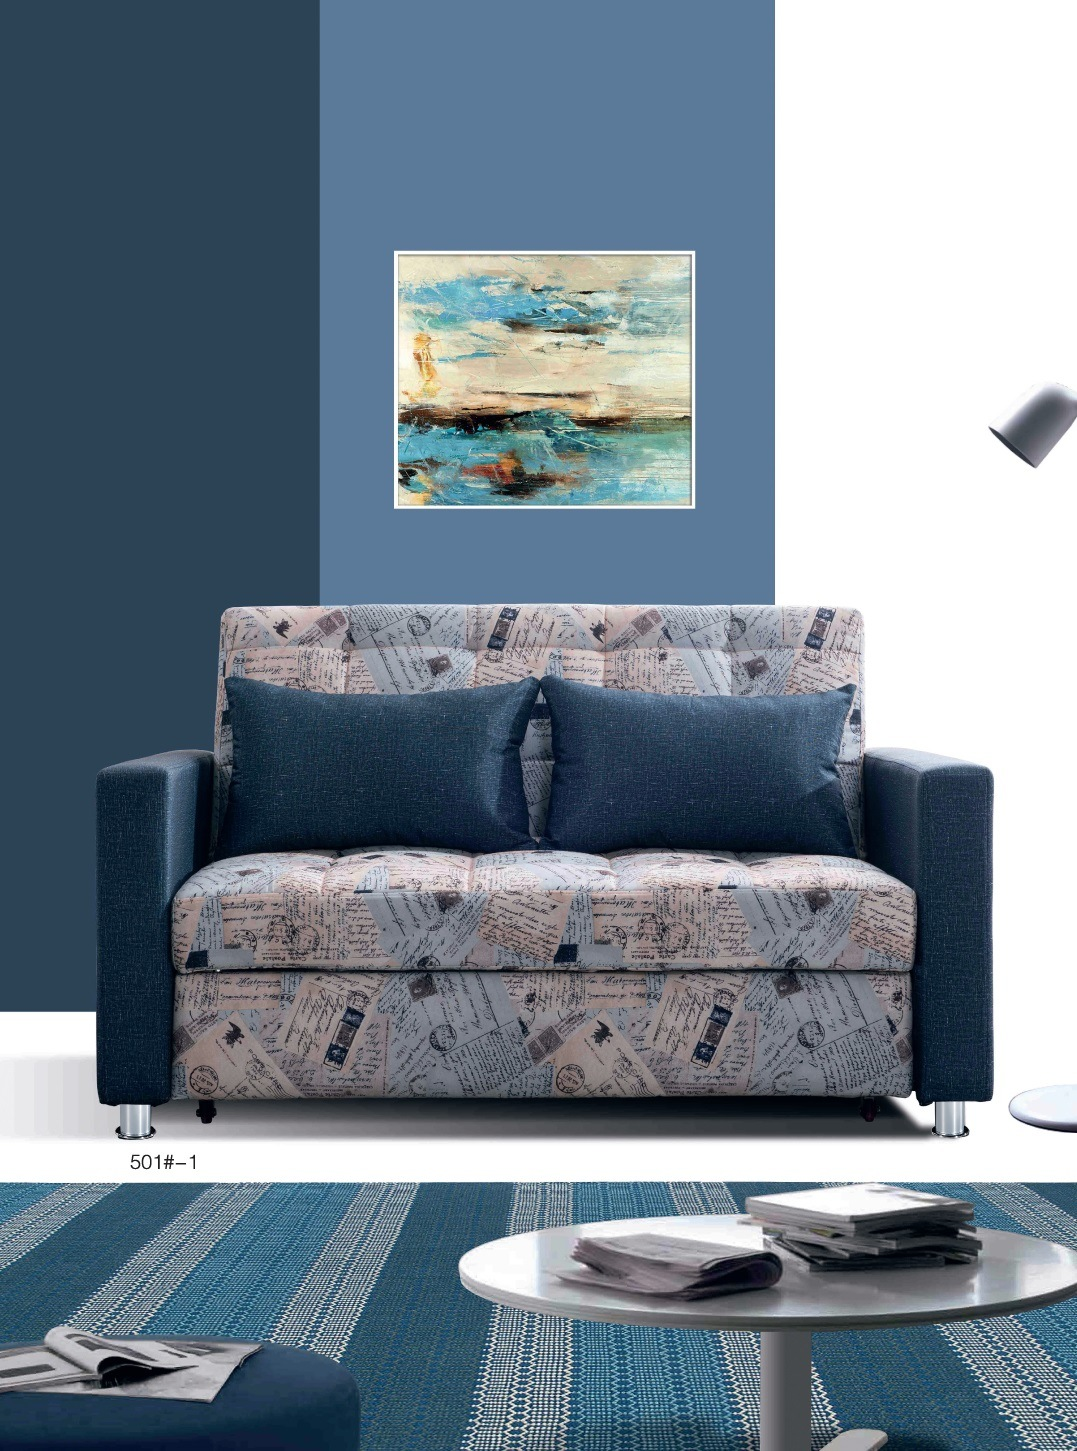 Sofa Bed Sofa Sets Folding Fabric Sofa New Design Home Sofa Living Room Furniture 2019